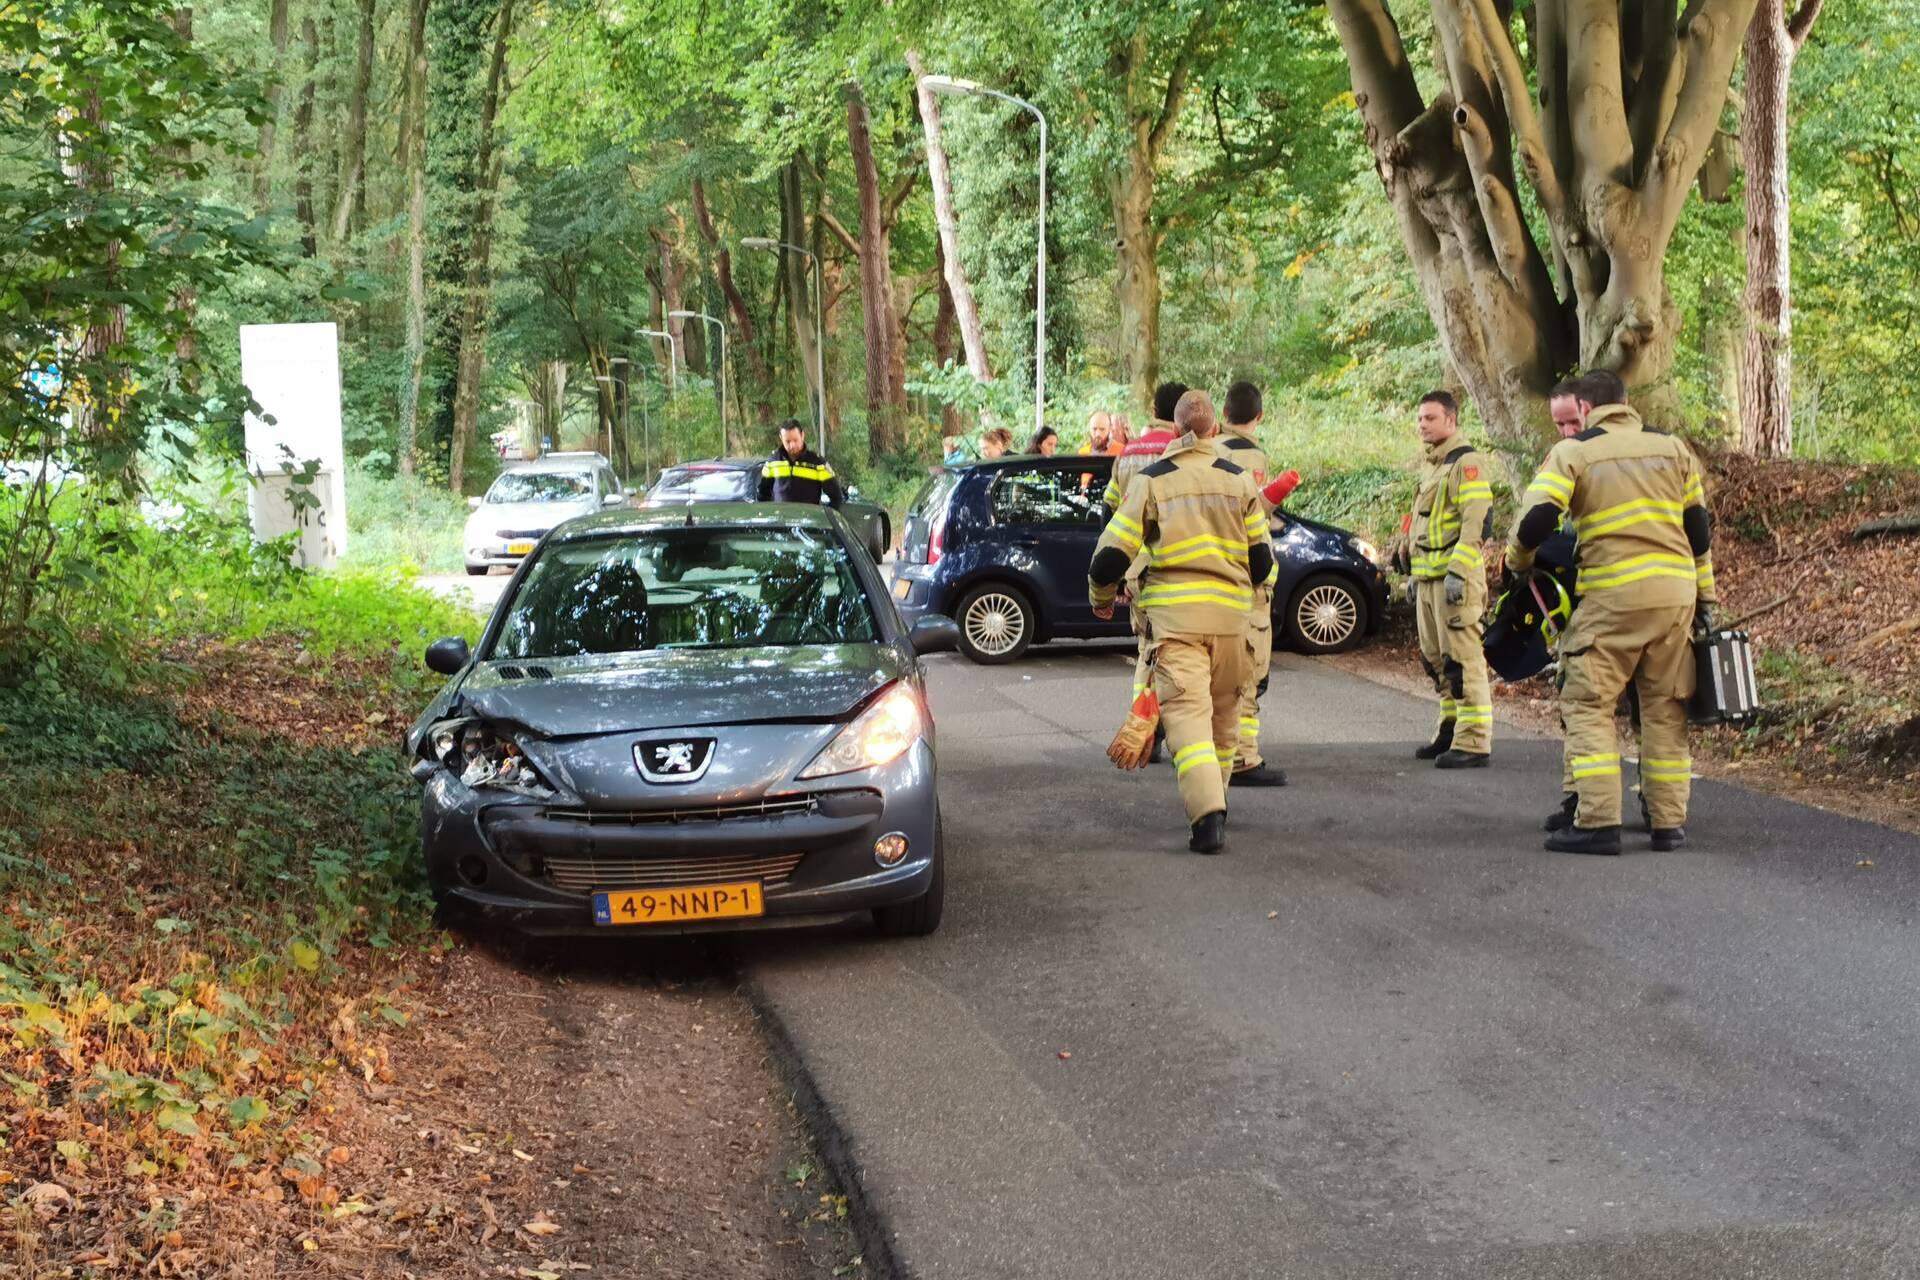 Verkeersopstopping na verkeersongeval op de Horalaan in Ede.